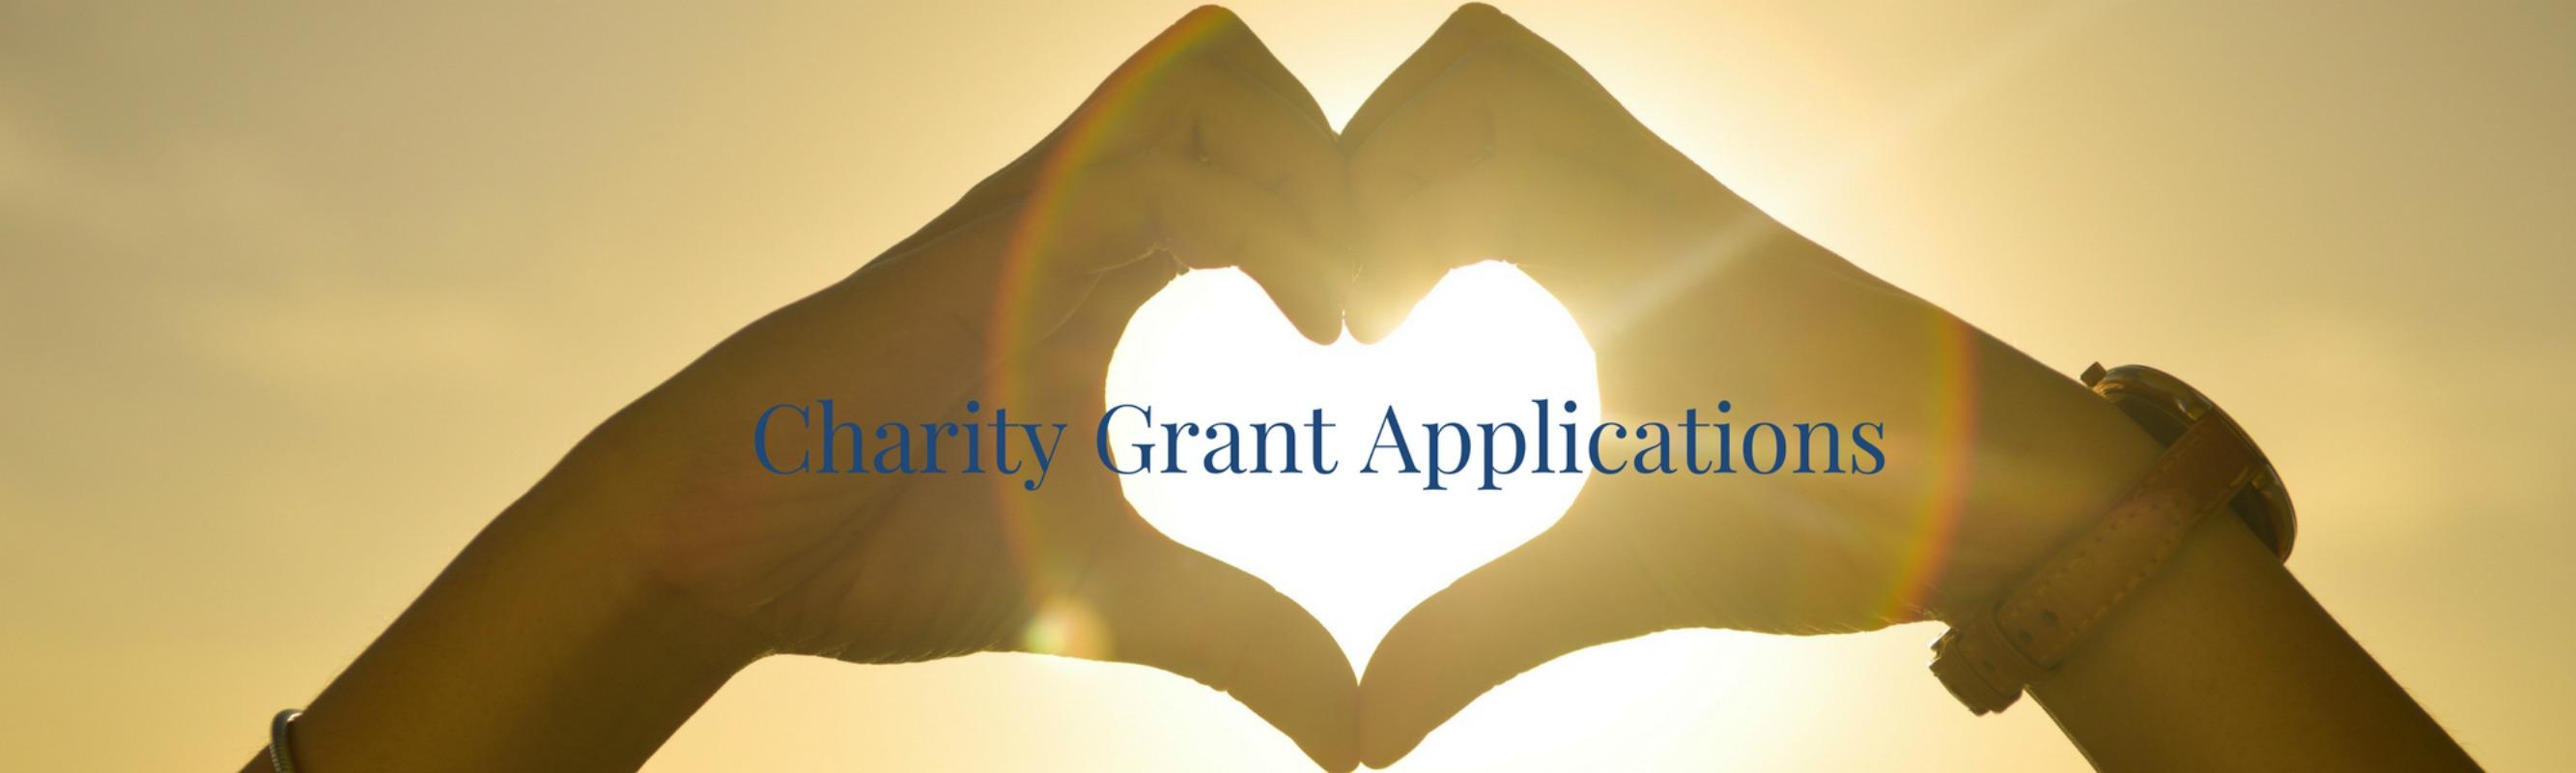 2018 Charity Grant